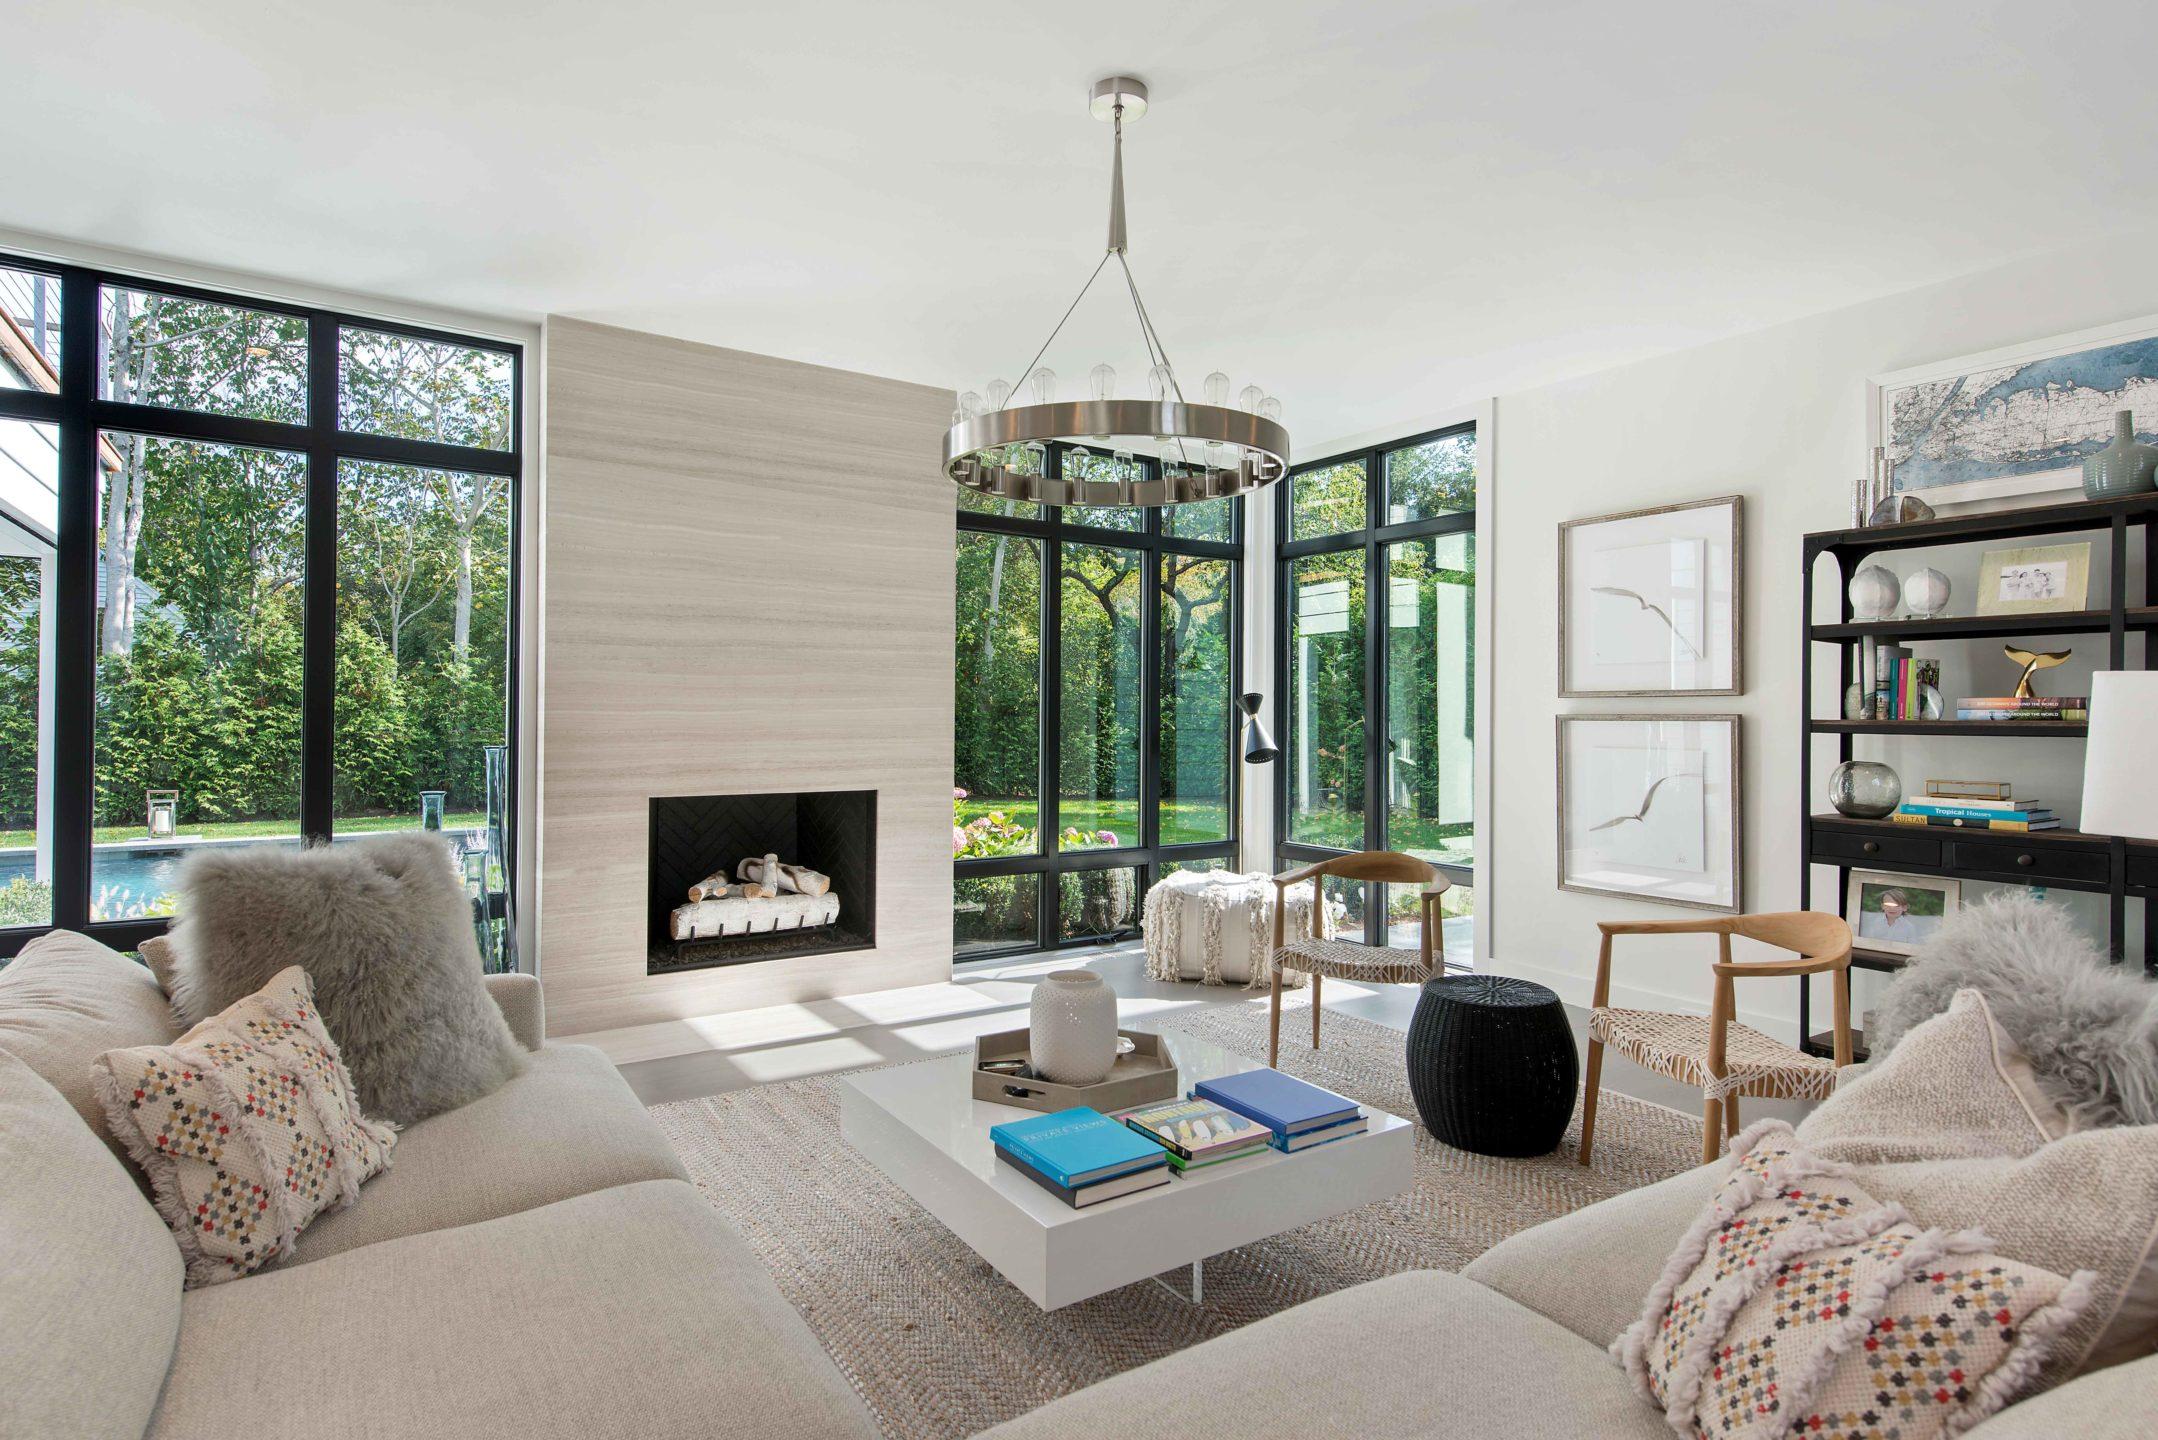 Nicole-Fuller-Interior-Designer-east-hampton-modern-bohemian-beach-house-living-room-3